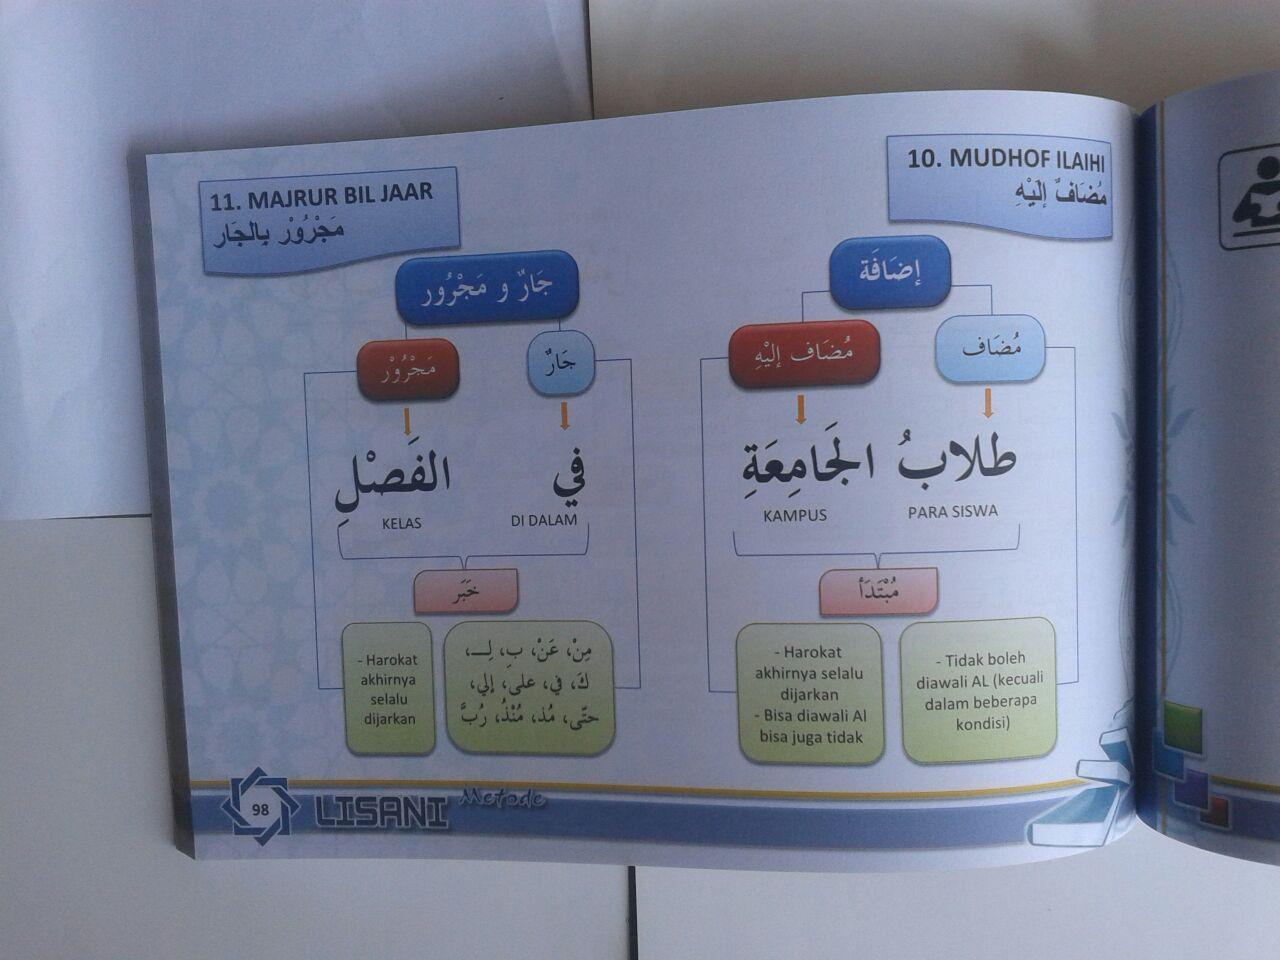 Buku 4 Langkah Tepat Membaca Kitab Arab Metode Lisani isi 2